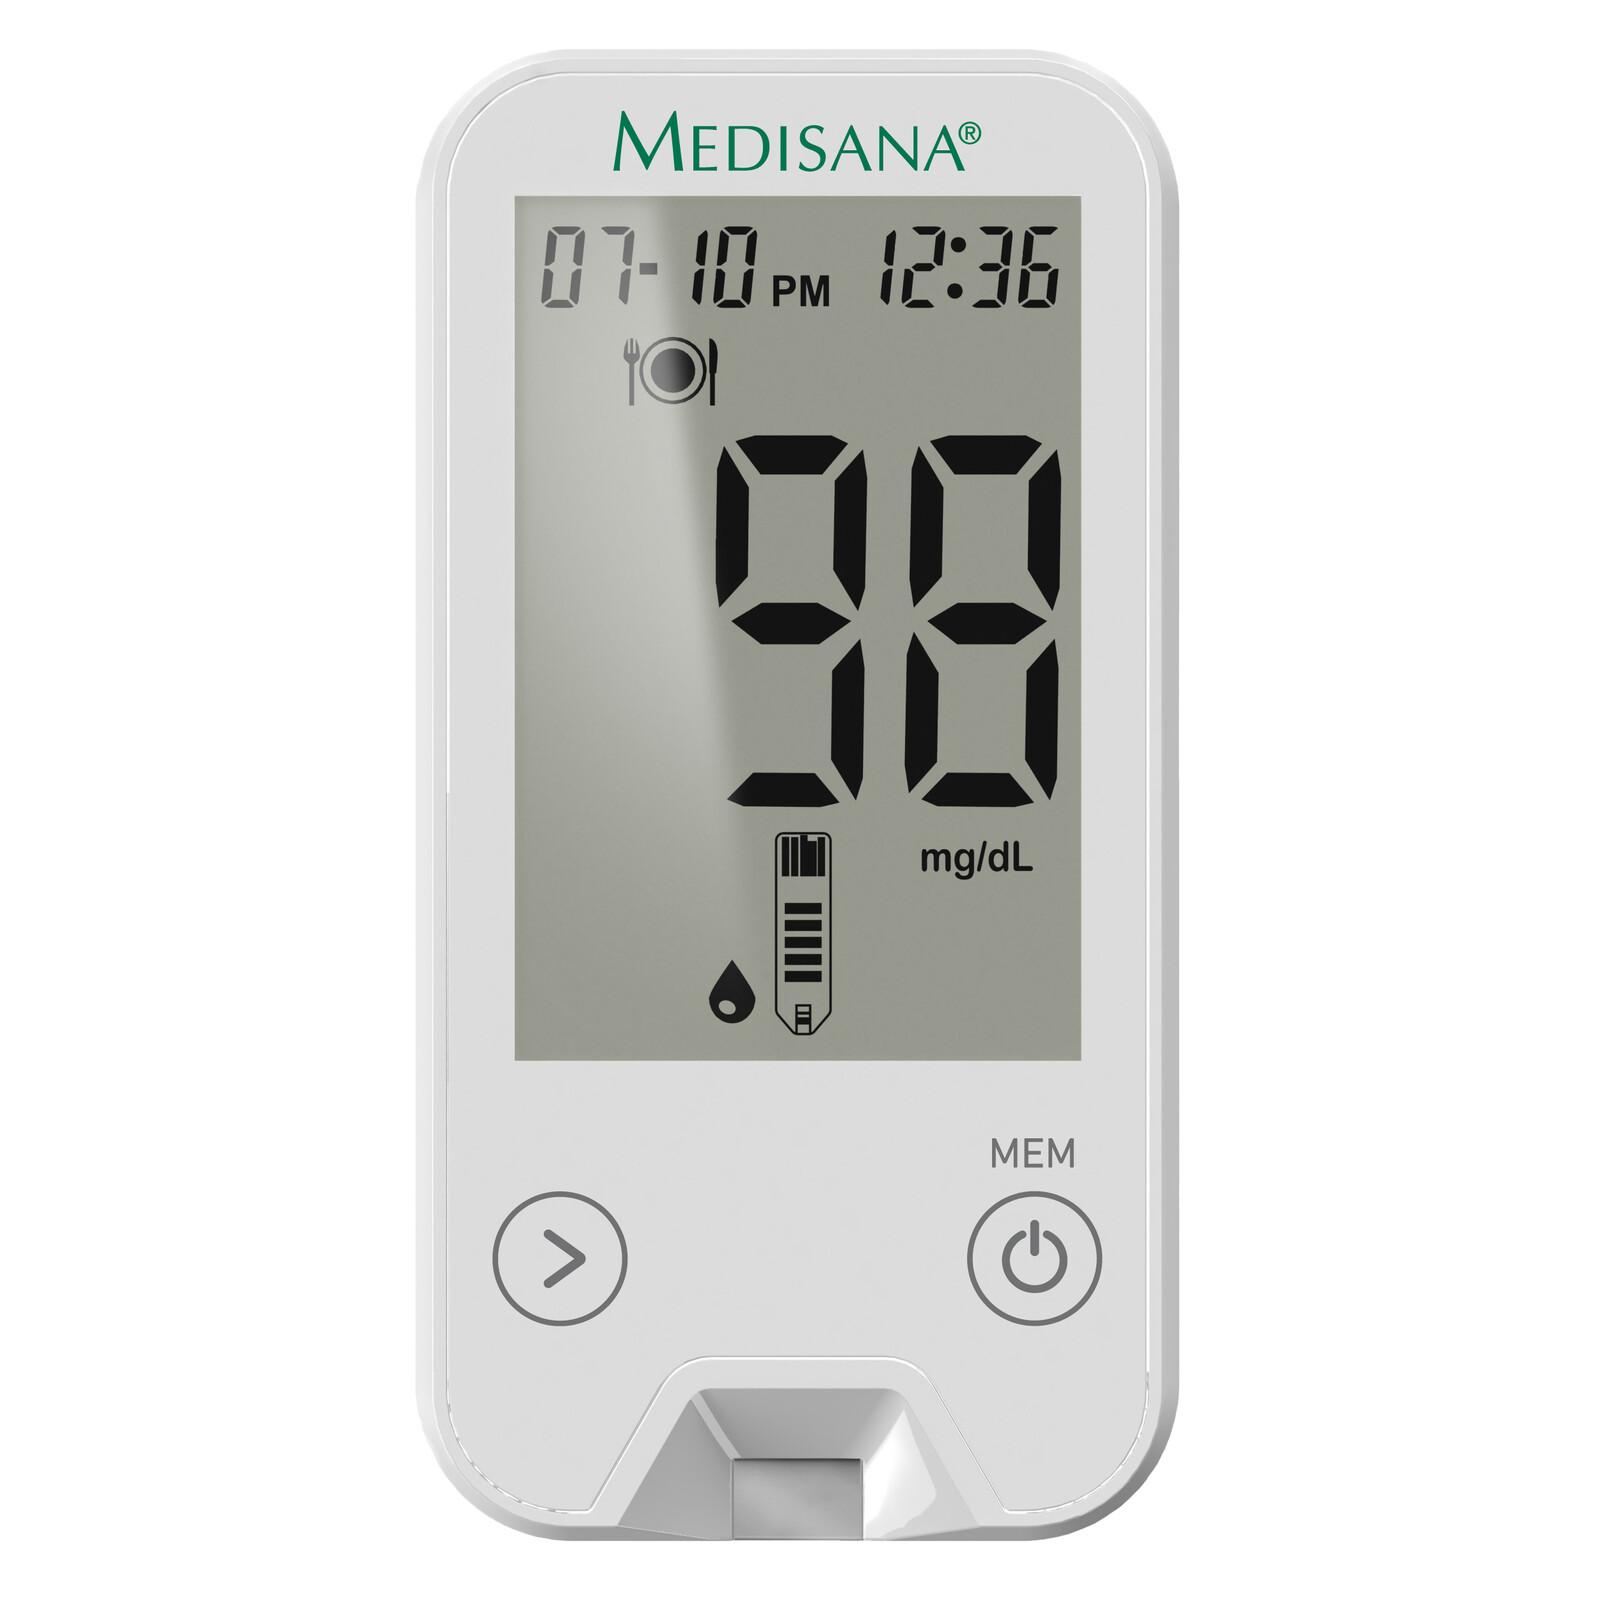 Medisana Medi Touch 2 Blutzuckermessgerät